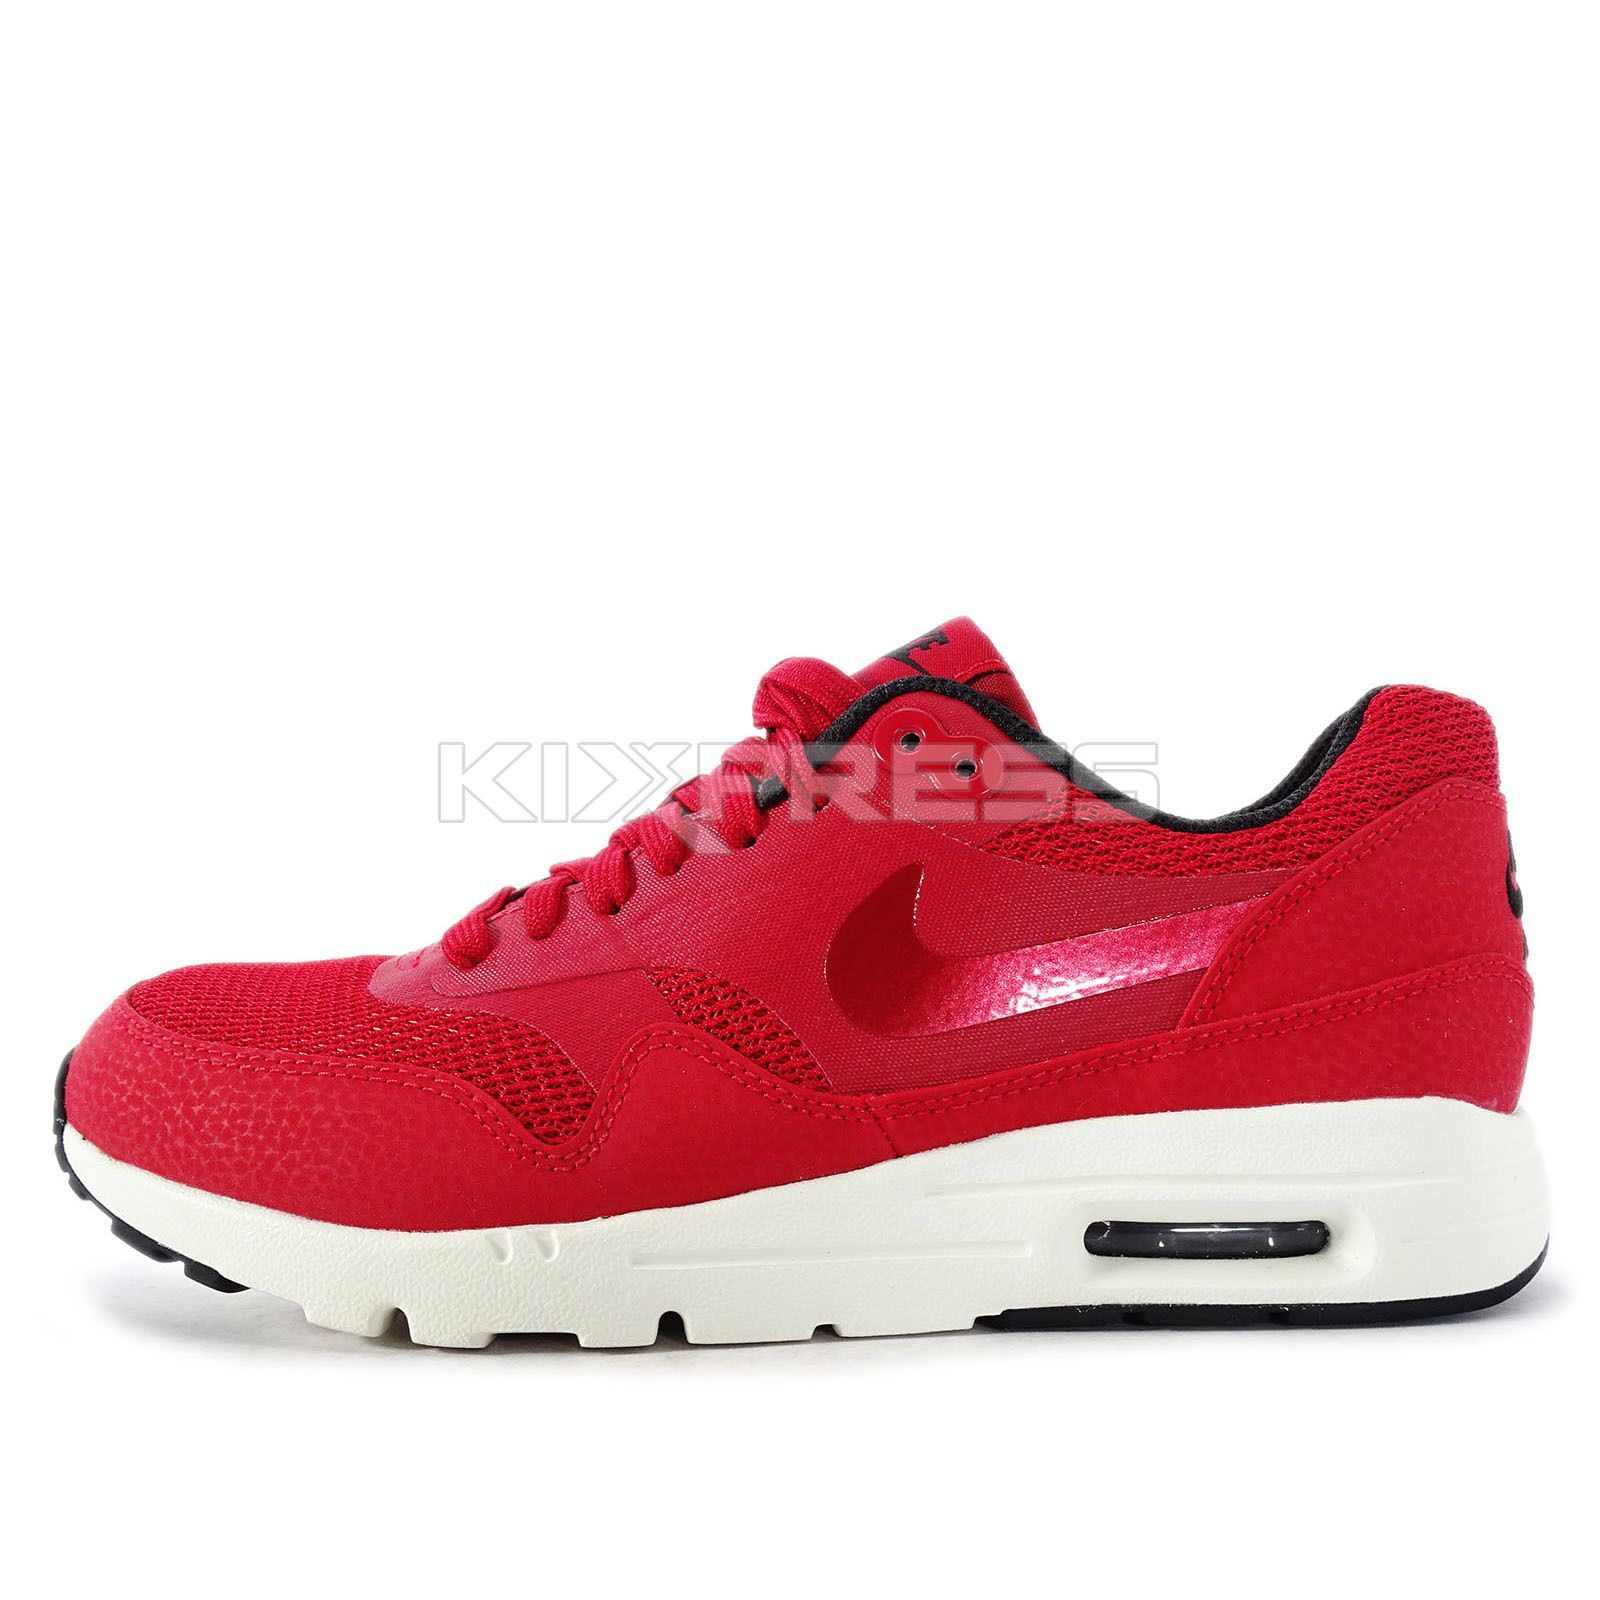 7047ab5e4f Wmns Nike Air Max 1 Ultra Essentials [704993-600] Nsw Running Gym Red/Black -Sail